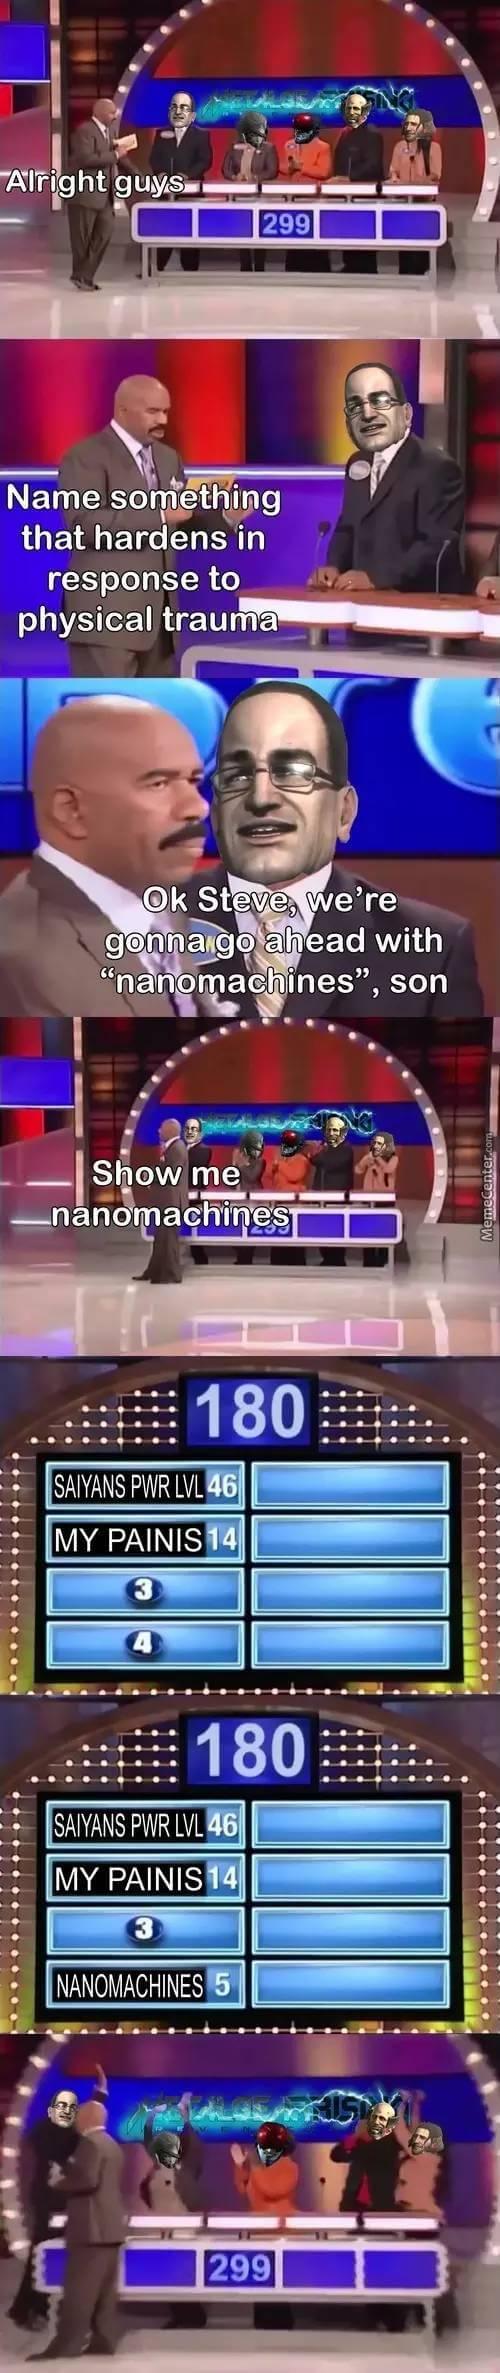 family feud memes 2 (1)